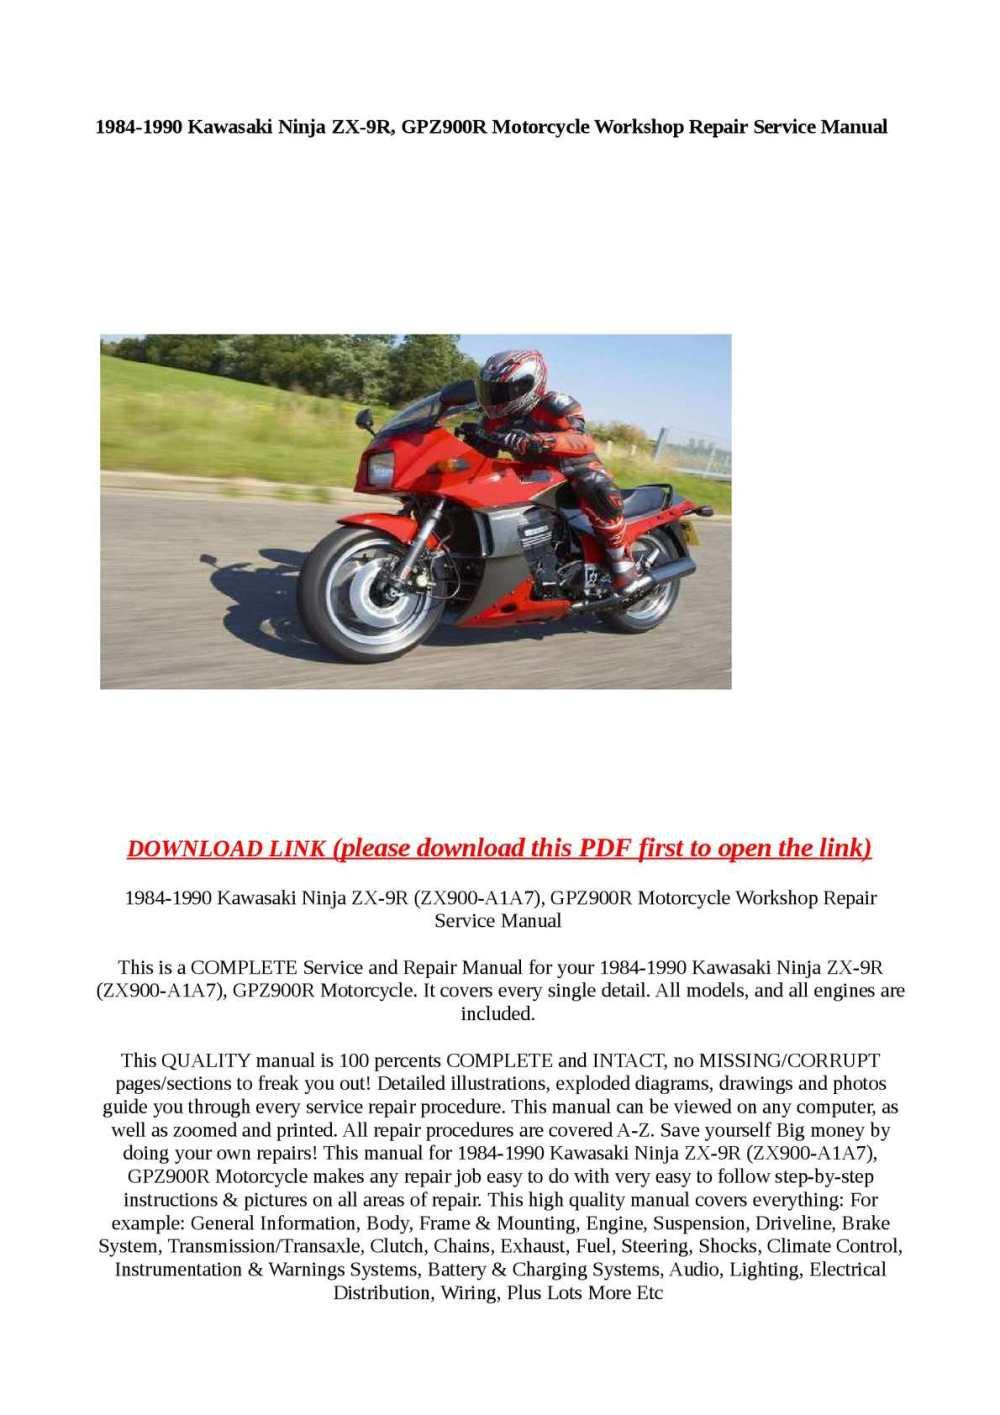 medium resolution of 1984 1990 kawasaki ninja zx 9r gpz900r motorcycle worksh